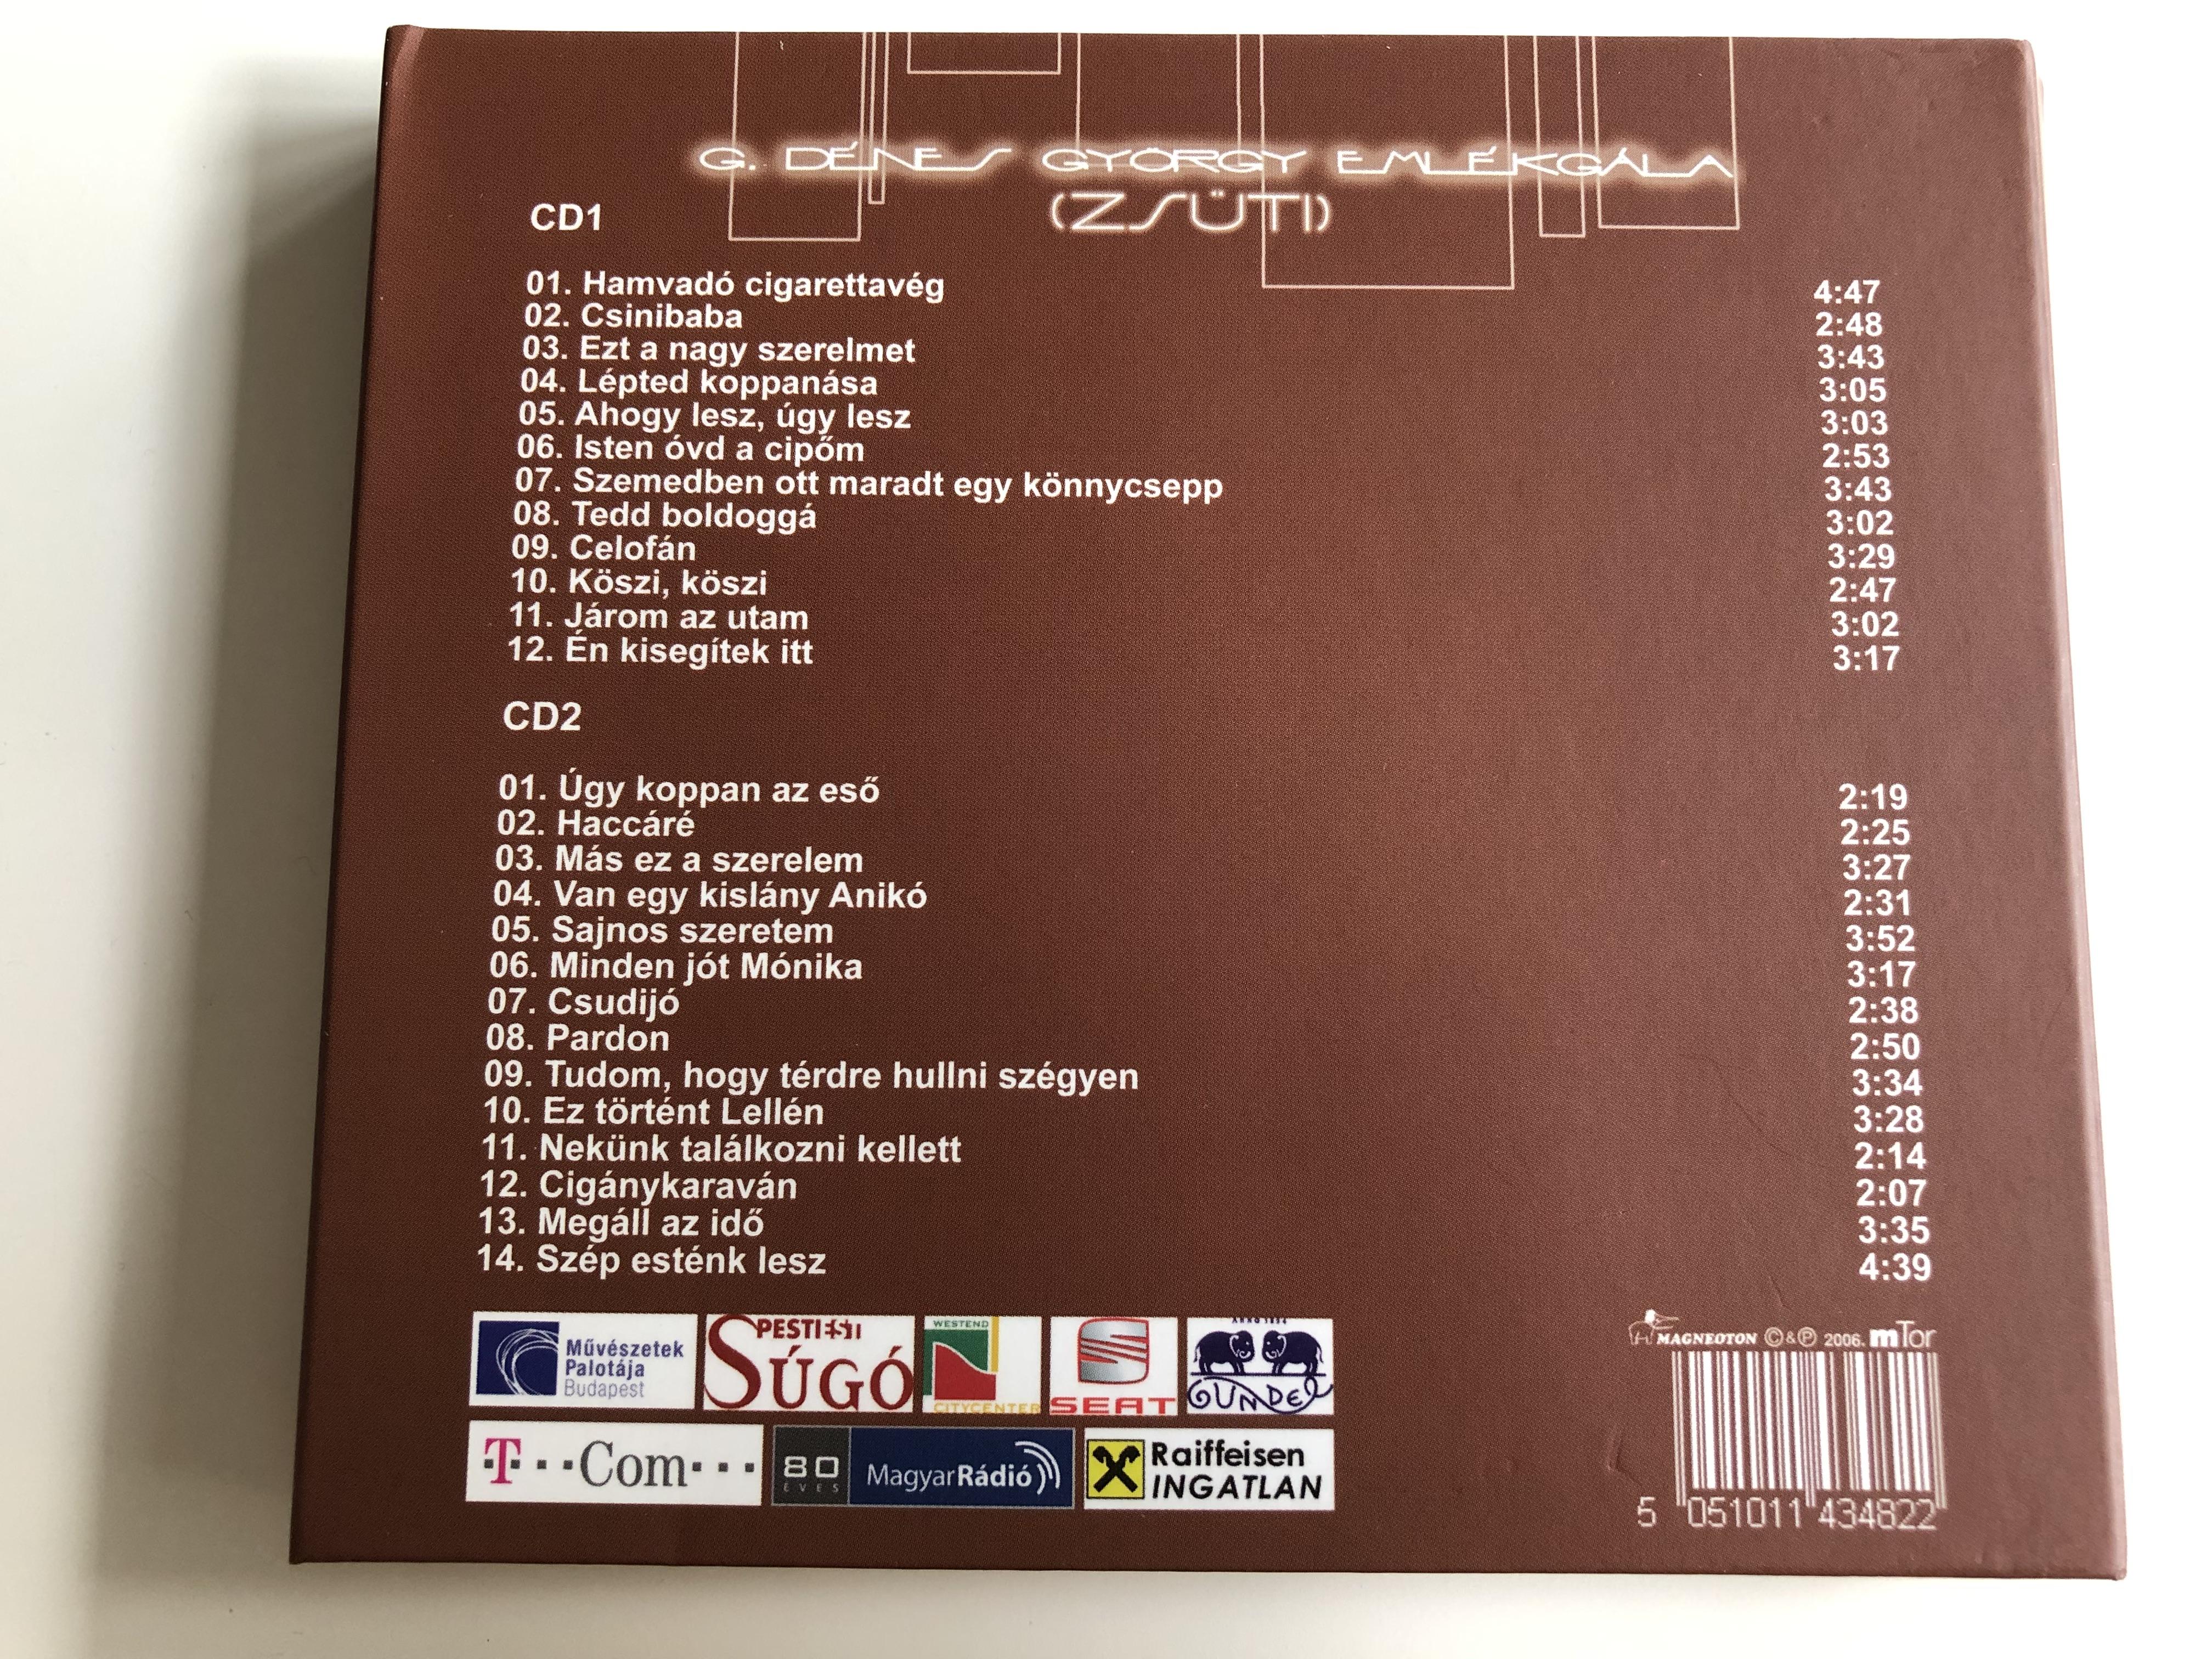 g.-d-nes-gy-rgy-eml-kg-la-zs-ti-danubia-symphony-orchestra-r-tonyi-r-bert-concert-master-bujtor-bal-zs-magneoton-audio-cd-2006-10-.jpg